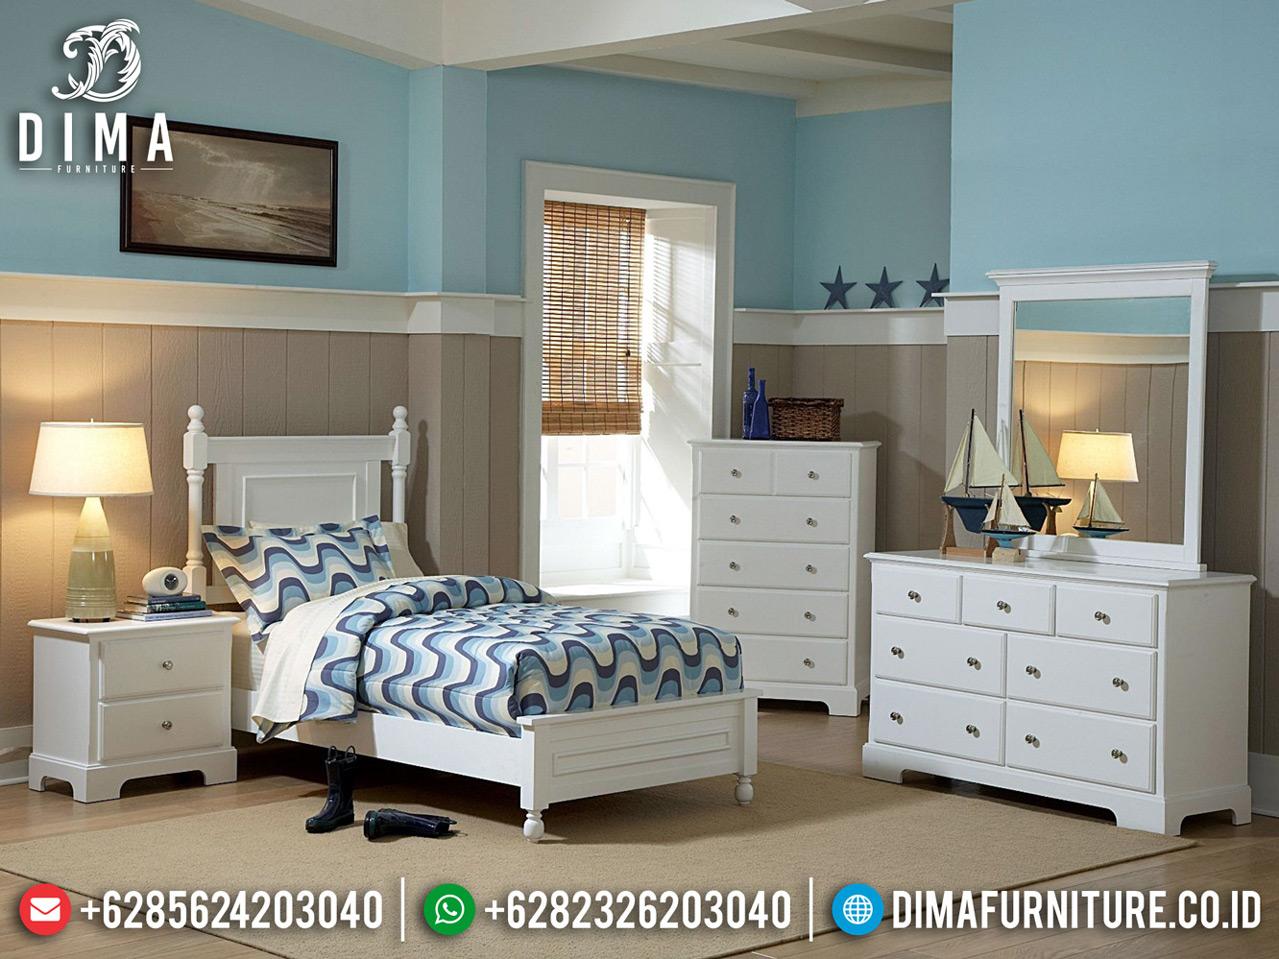 Tempat Tidur Anak Putih Duco New Style Terbaru Best Quality Kayu Perhutani TTJ-0764